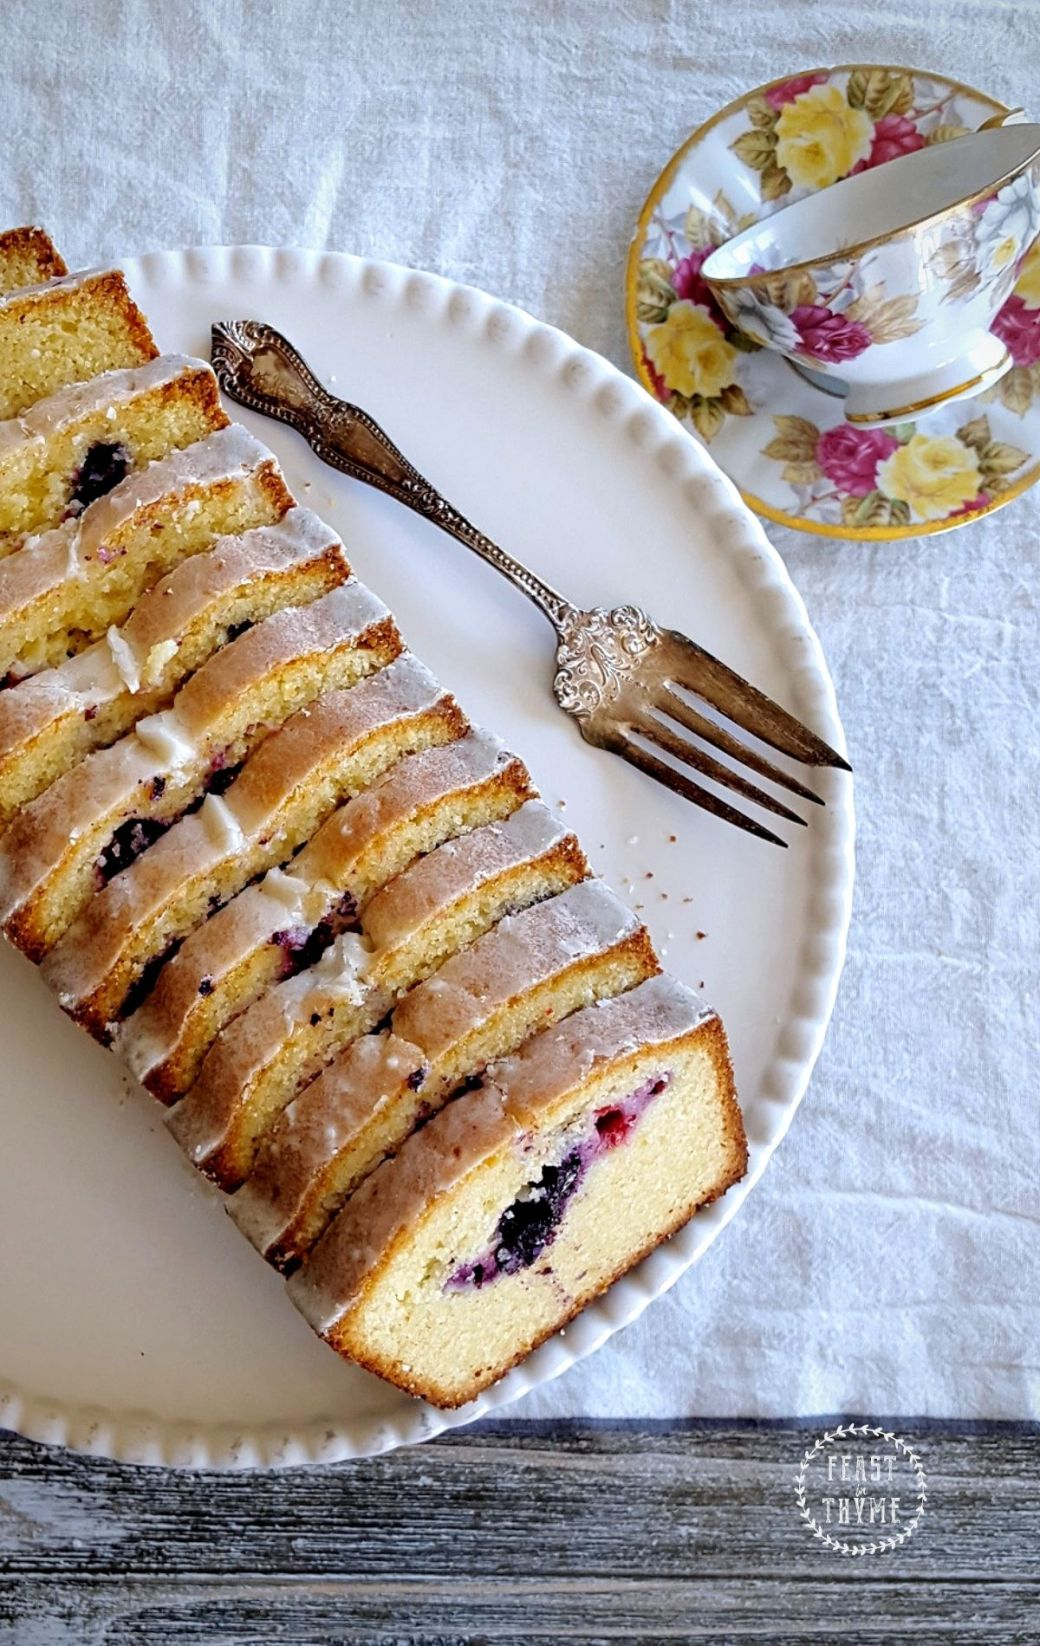 Afissa's Harken Cake with Vanilla Glaze & Mixed Berries